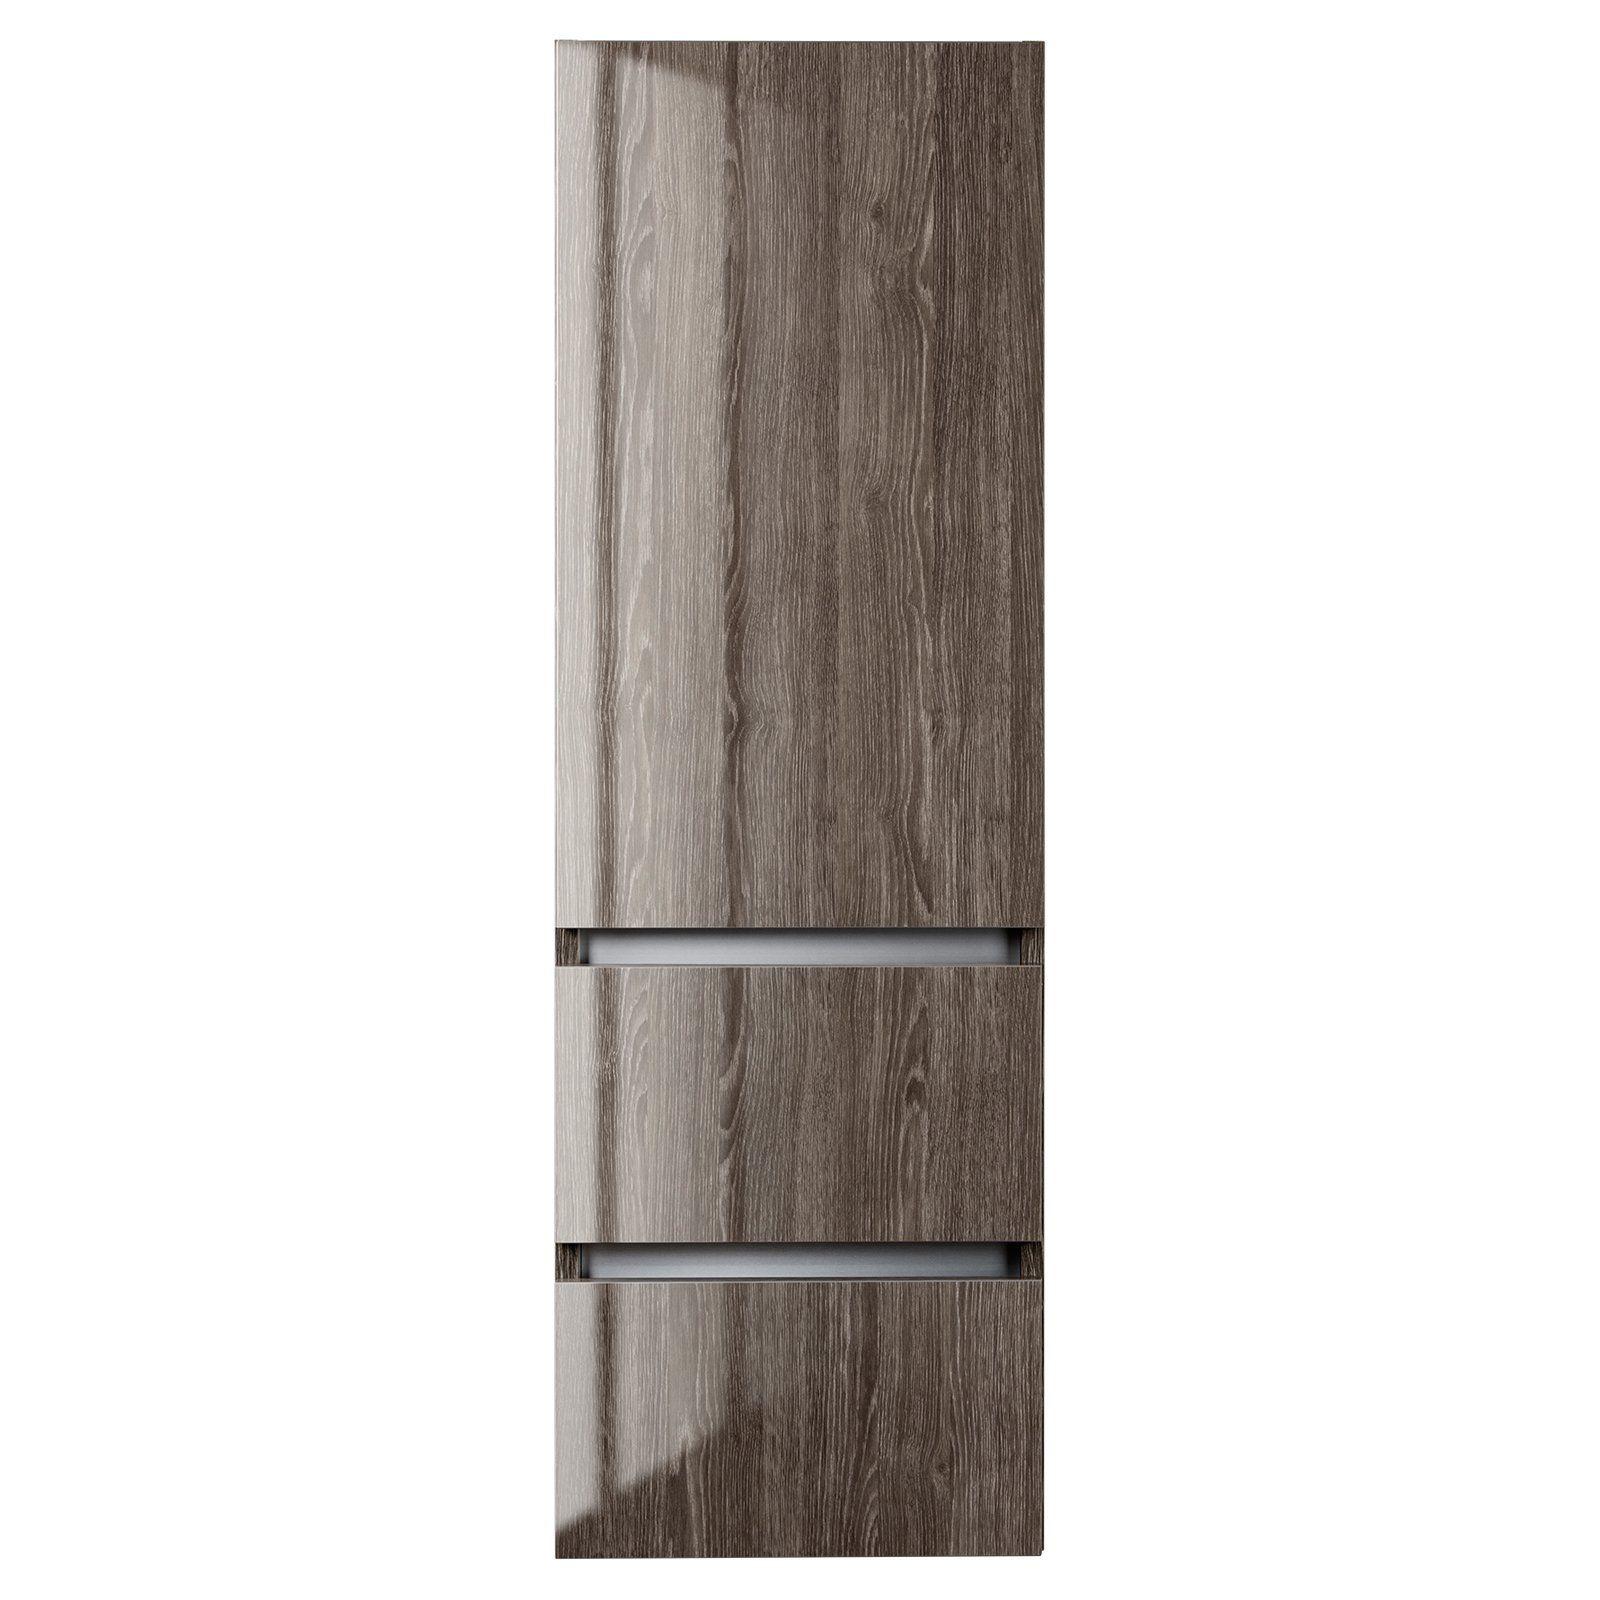 Cutler Kitchen & Bath Sangallo 15 in. Wall Hung Gloss Linen Tower ...